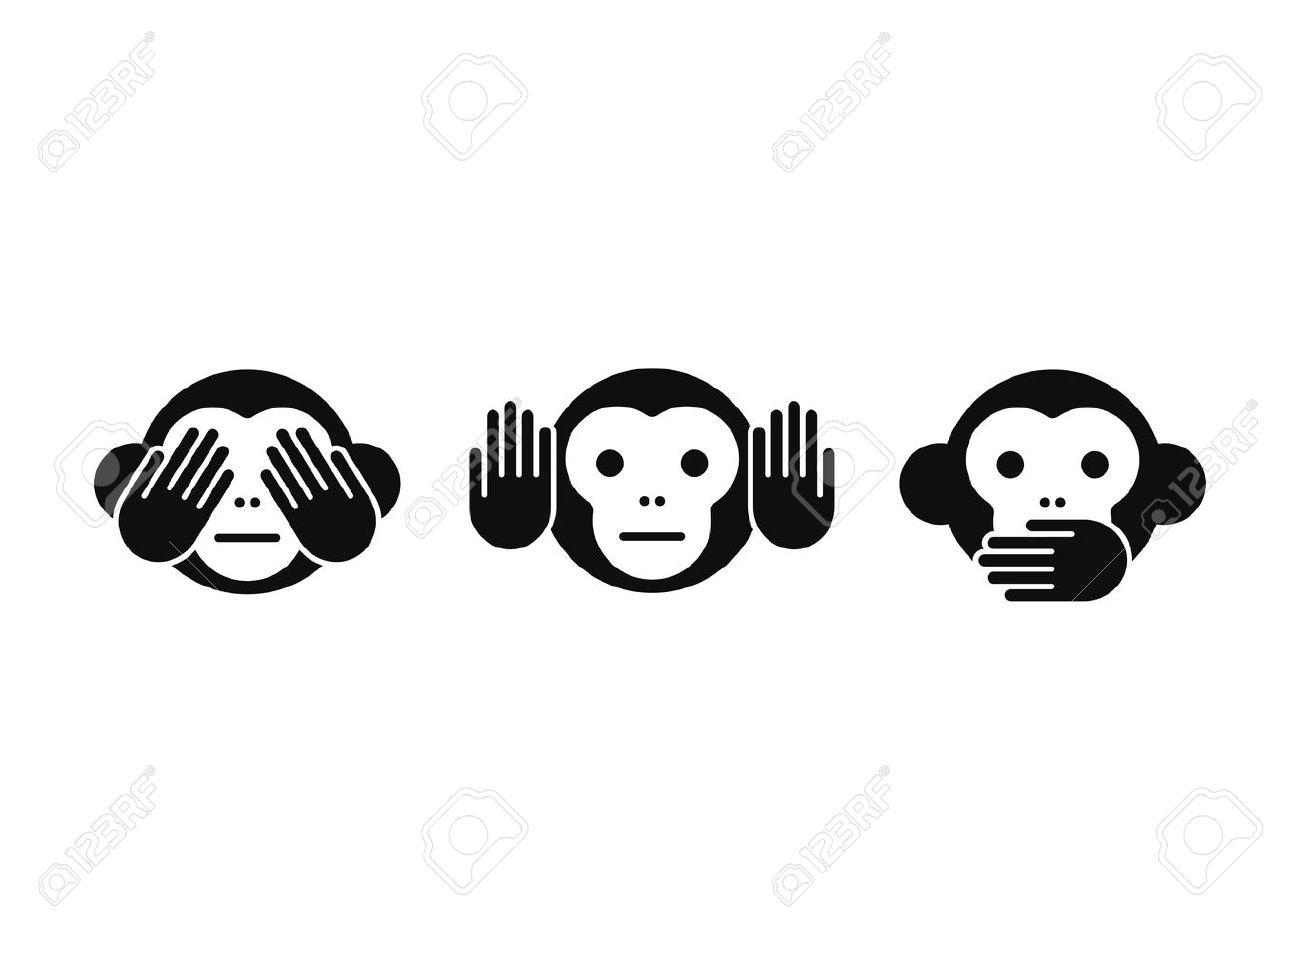 See no Evil, Hear no Evil, Speak no Evil monkey icon set. Simple modern vector illustration. - 56096586